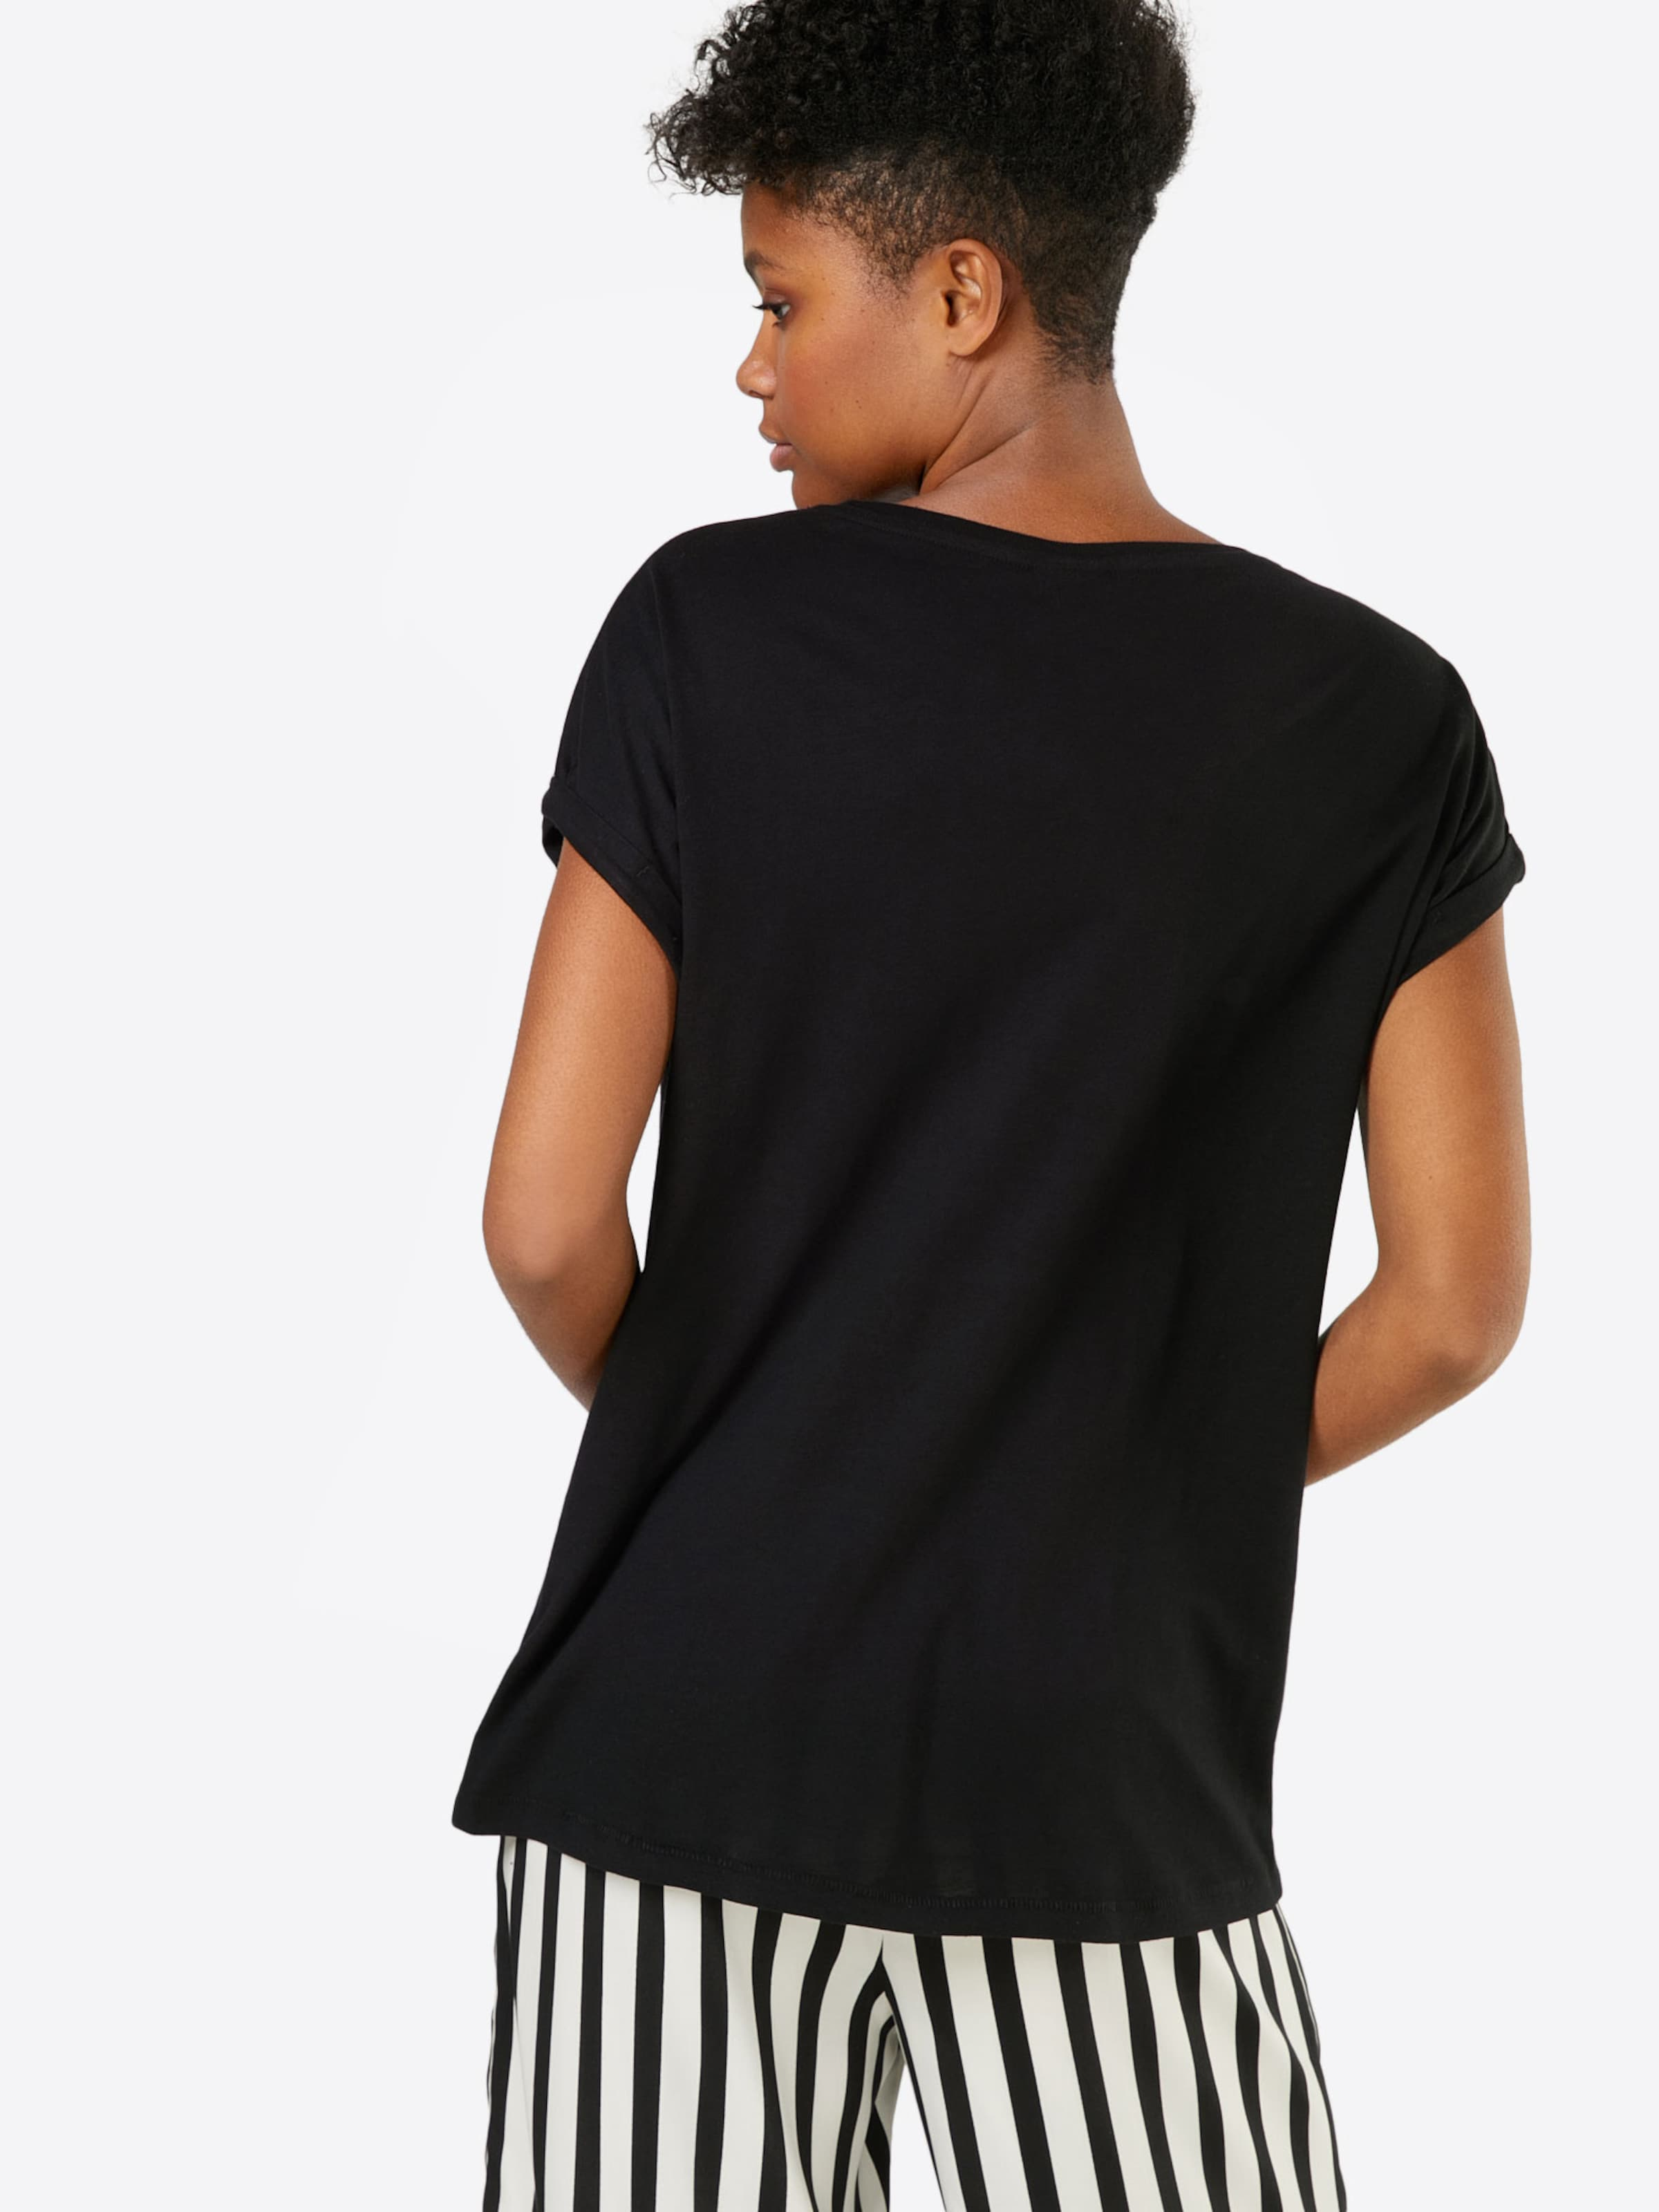 Urban Schwarz Extended Tee' Classics 'ladies In Shirt Shoulder lTFKJ31c